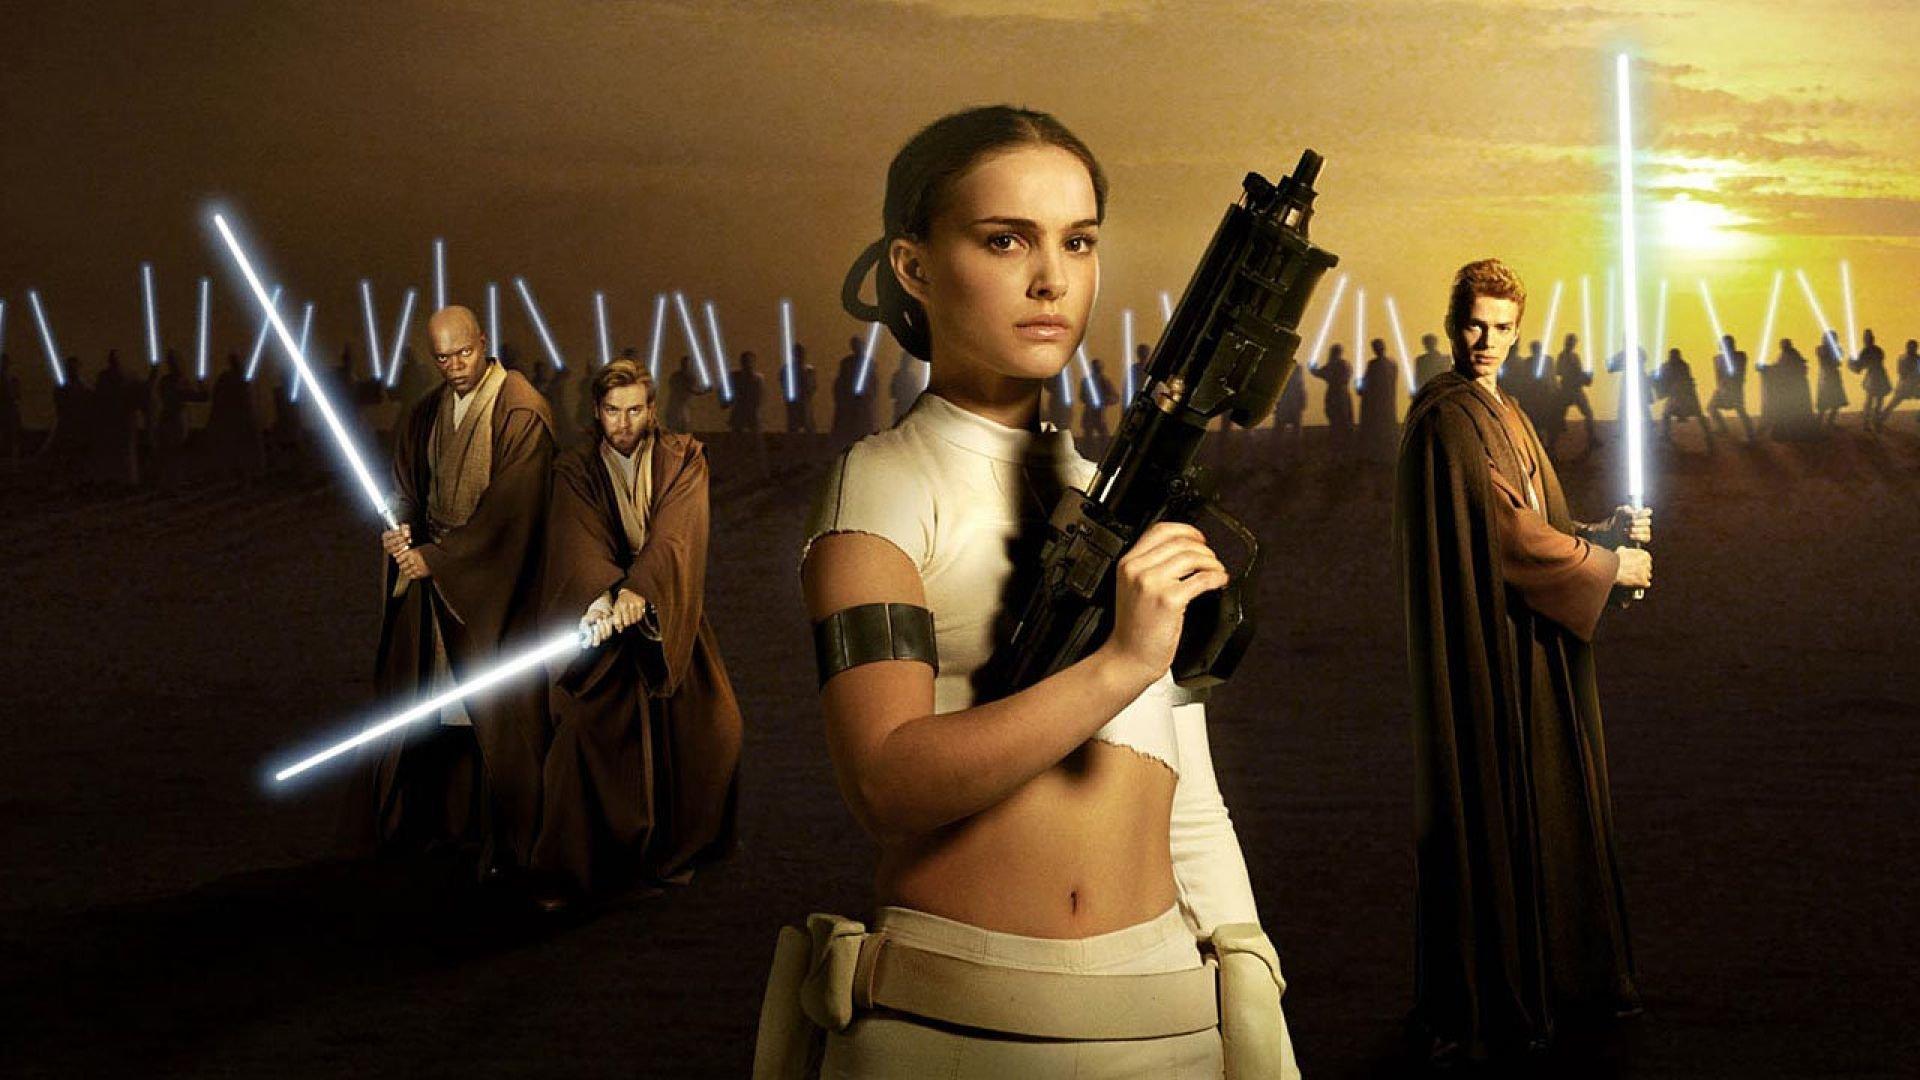 Star Wars Episode 3 Iii Revenge Of The Sith Wallpapers 1920x1080 Full Hd 1080p Desktop Backgrounds